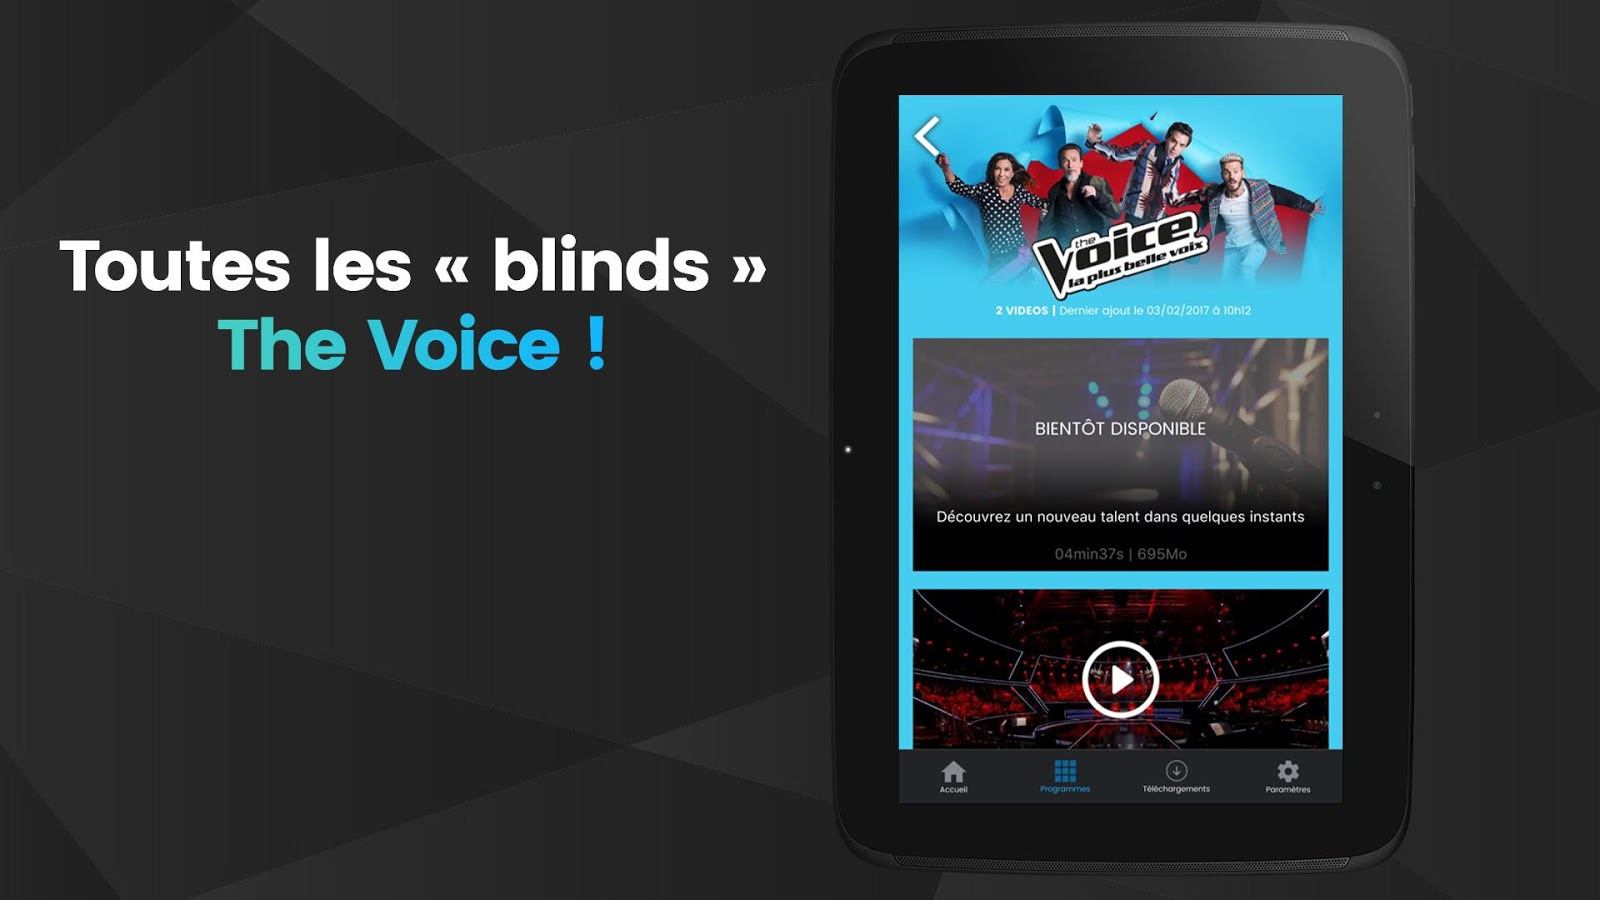 mytf1 vr - réalité virtuelle – applications android sur google play